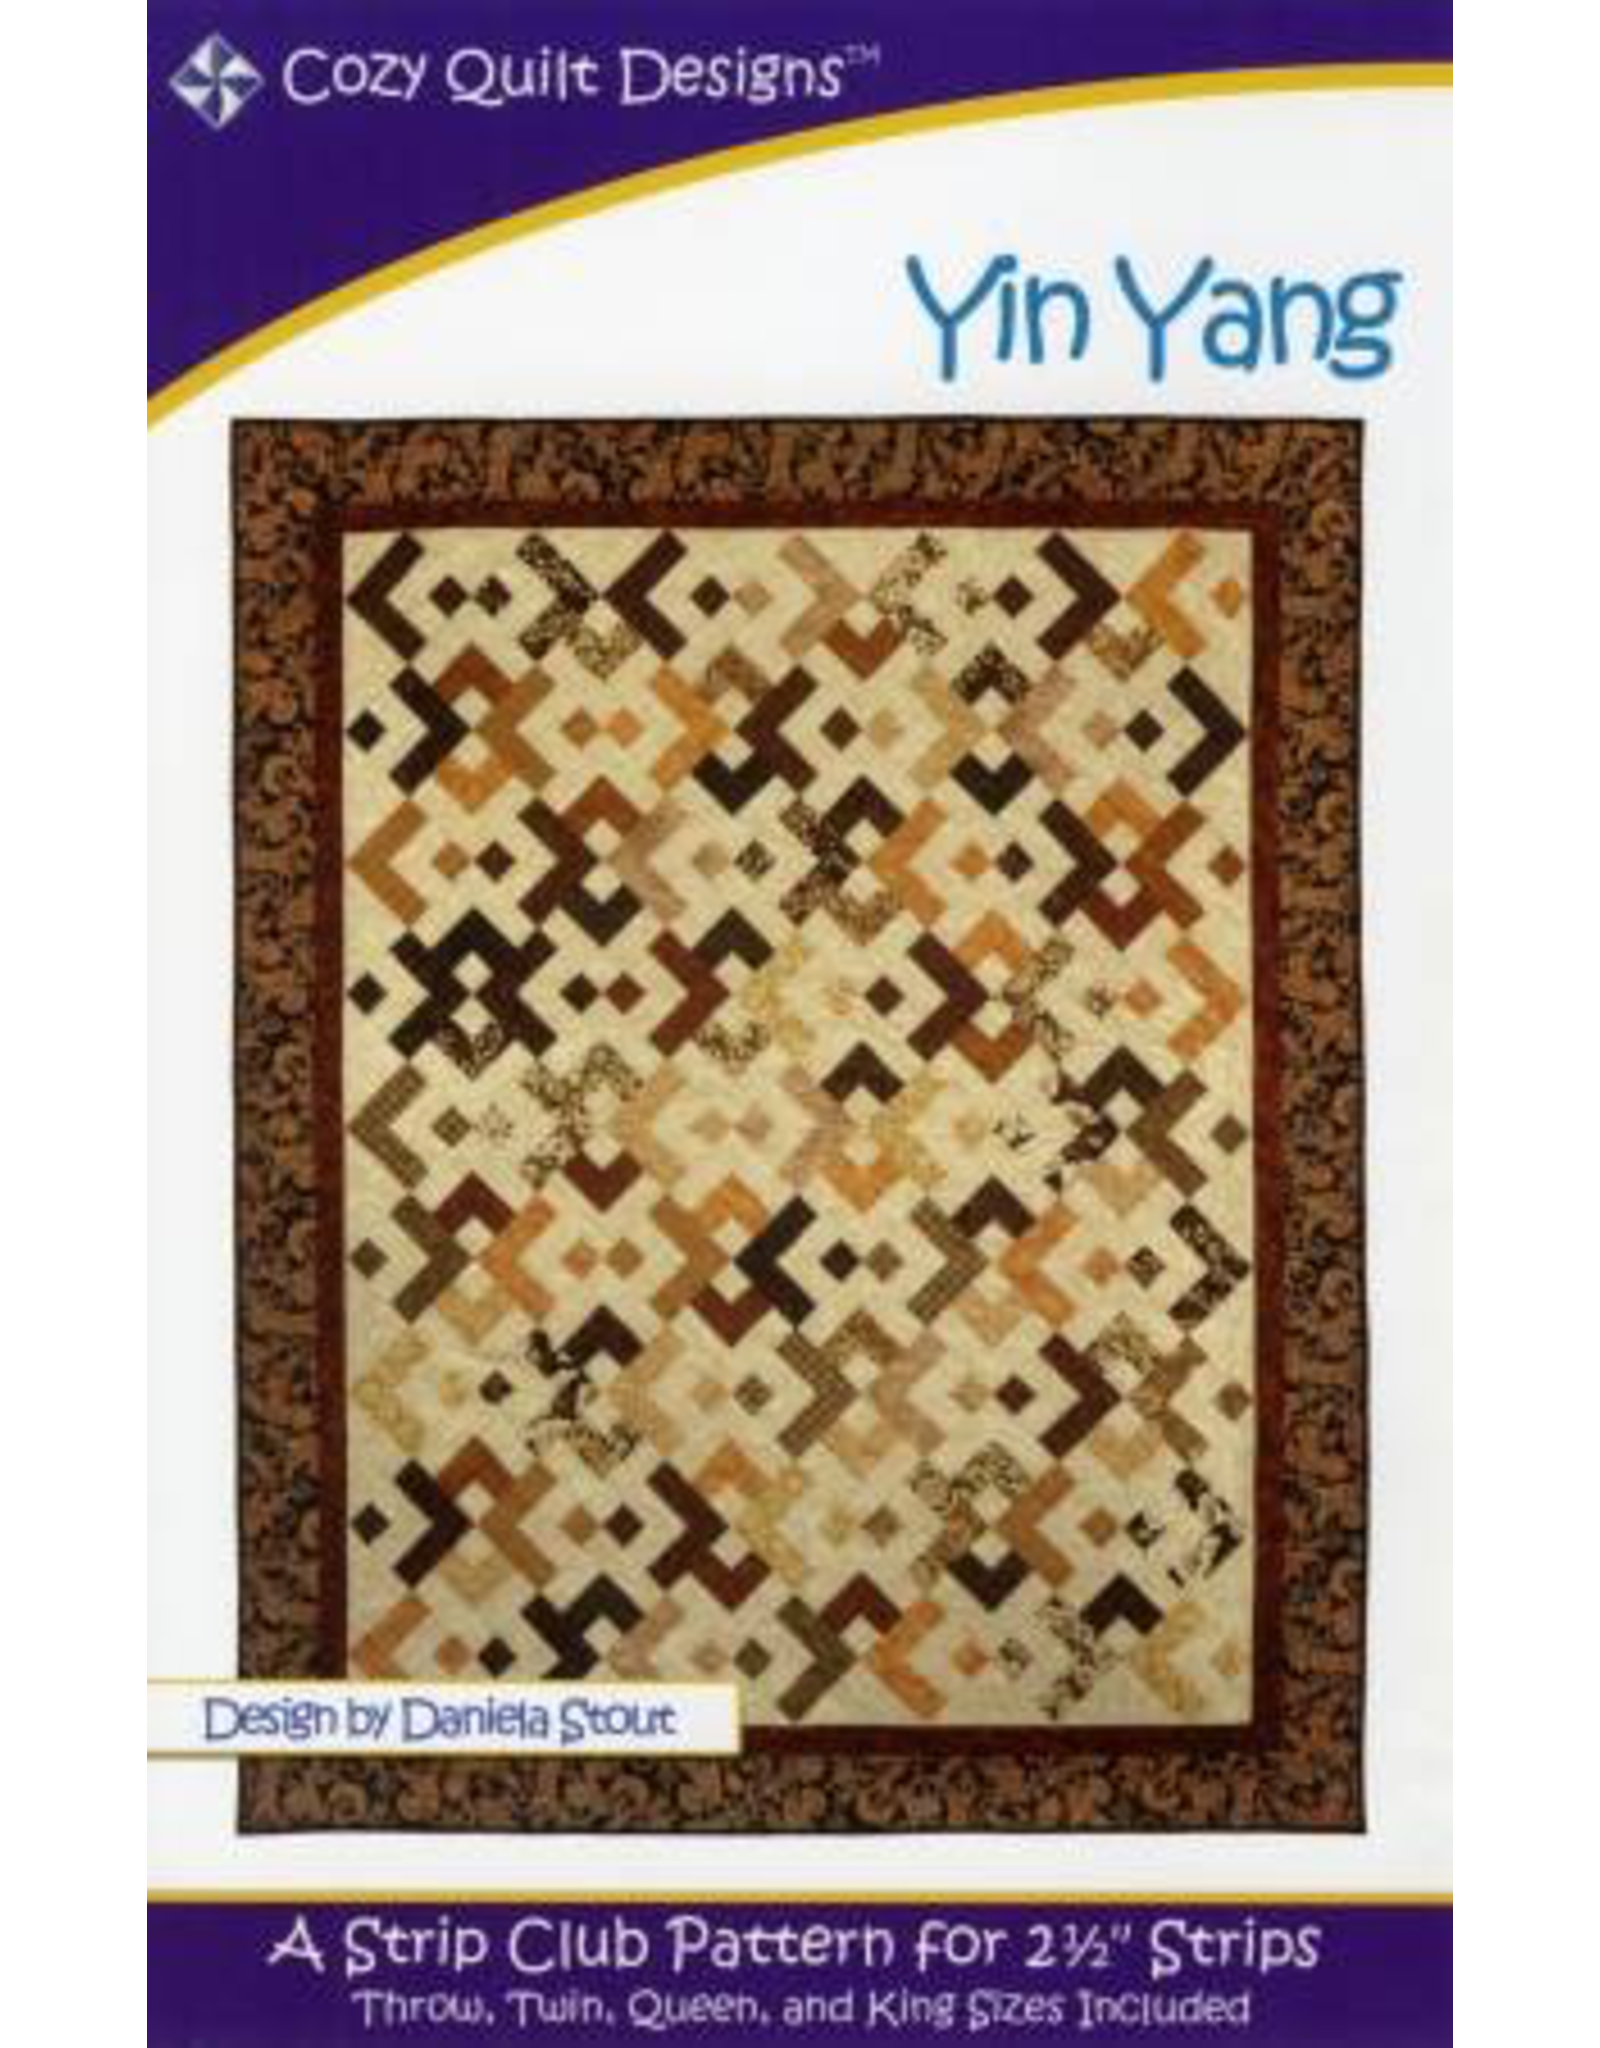 Yin Yang Pattern